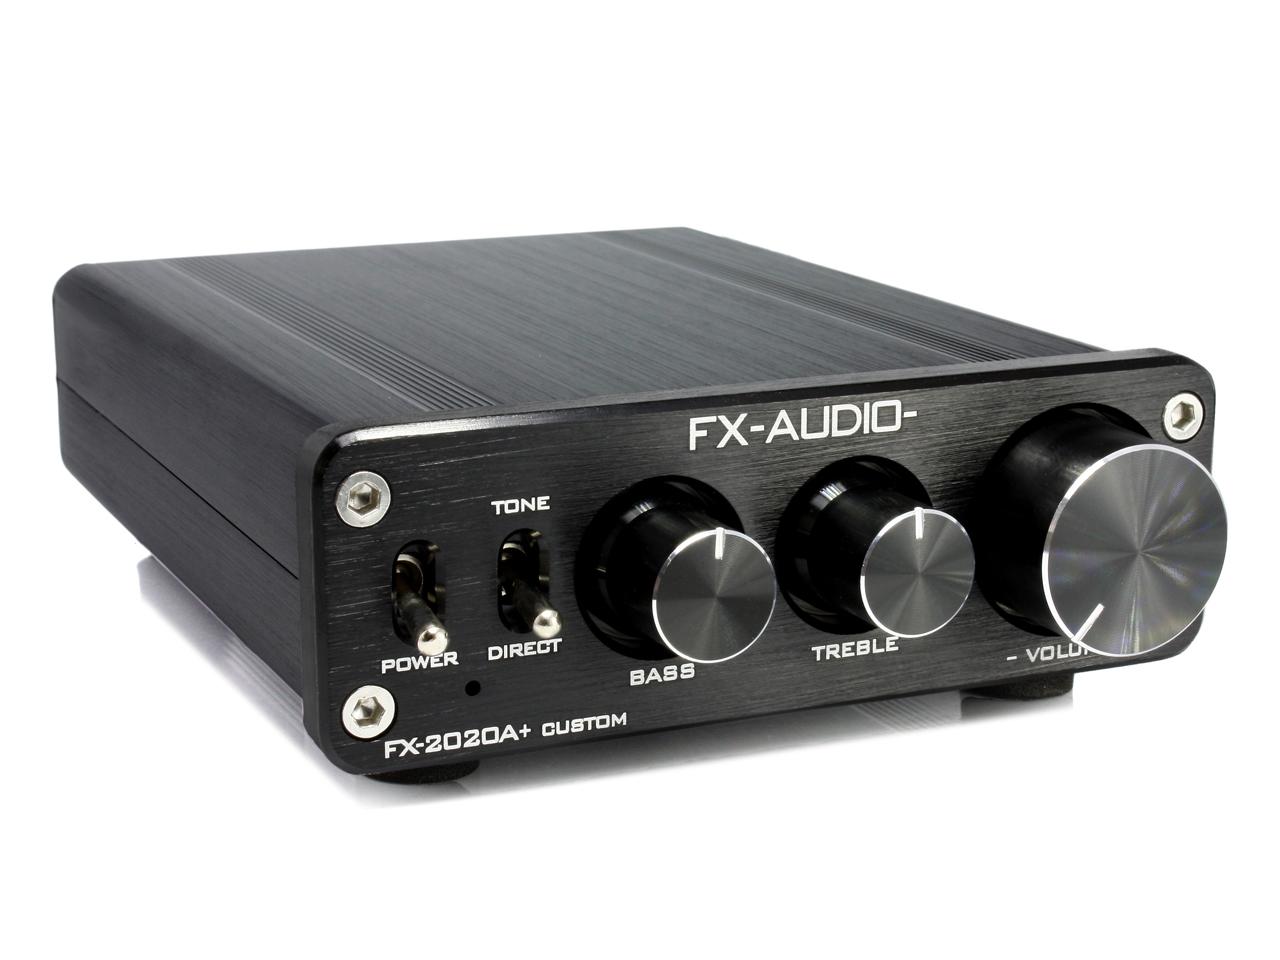 FX-AUDIO- FX-2020A+ CUSTOM [ブラック]TRIPATH製TA2020-020搭載デジタルアンプ